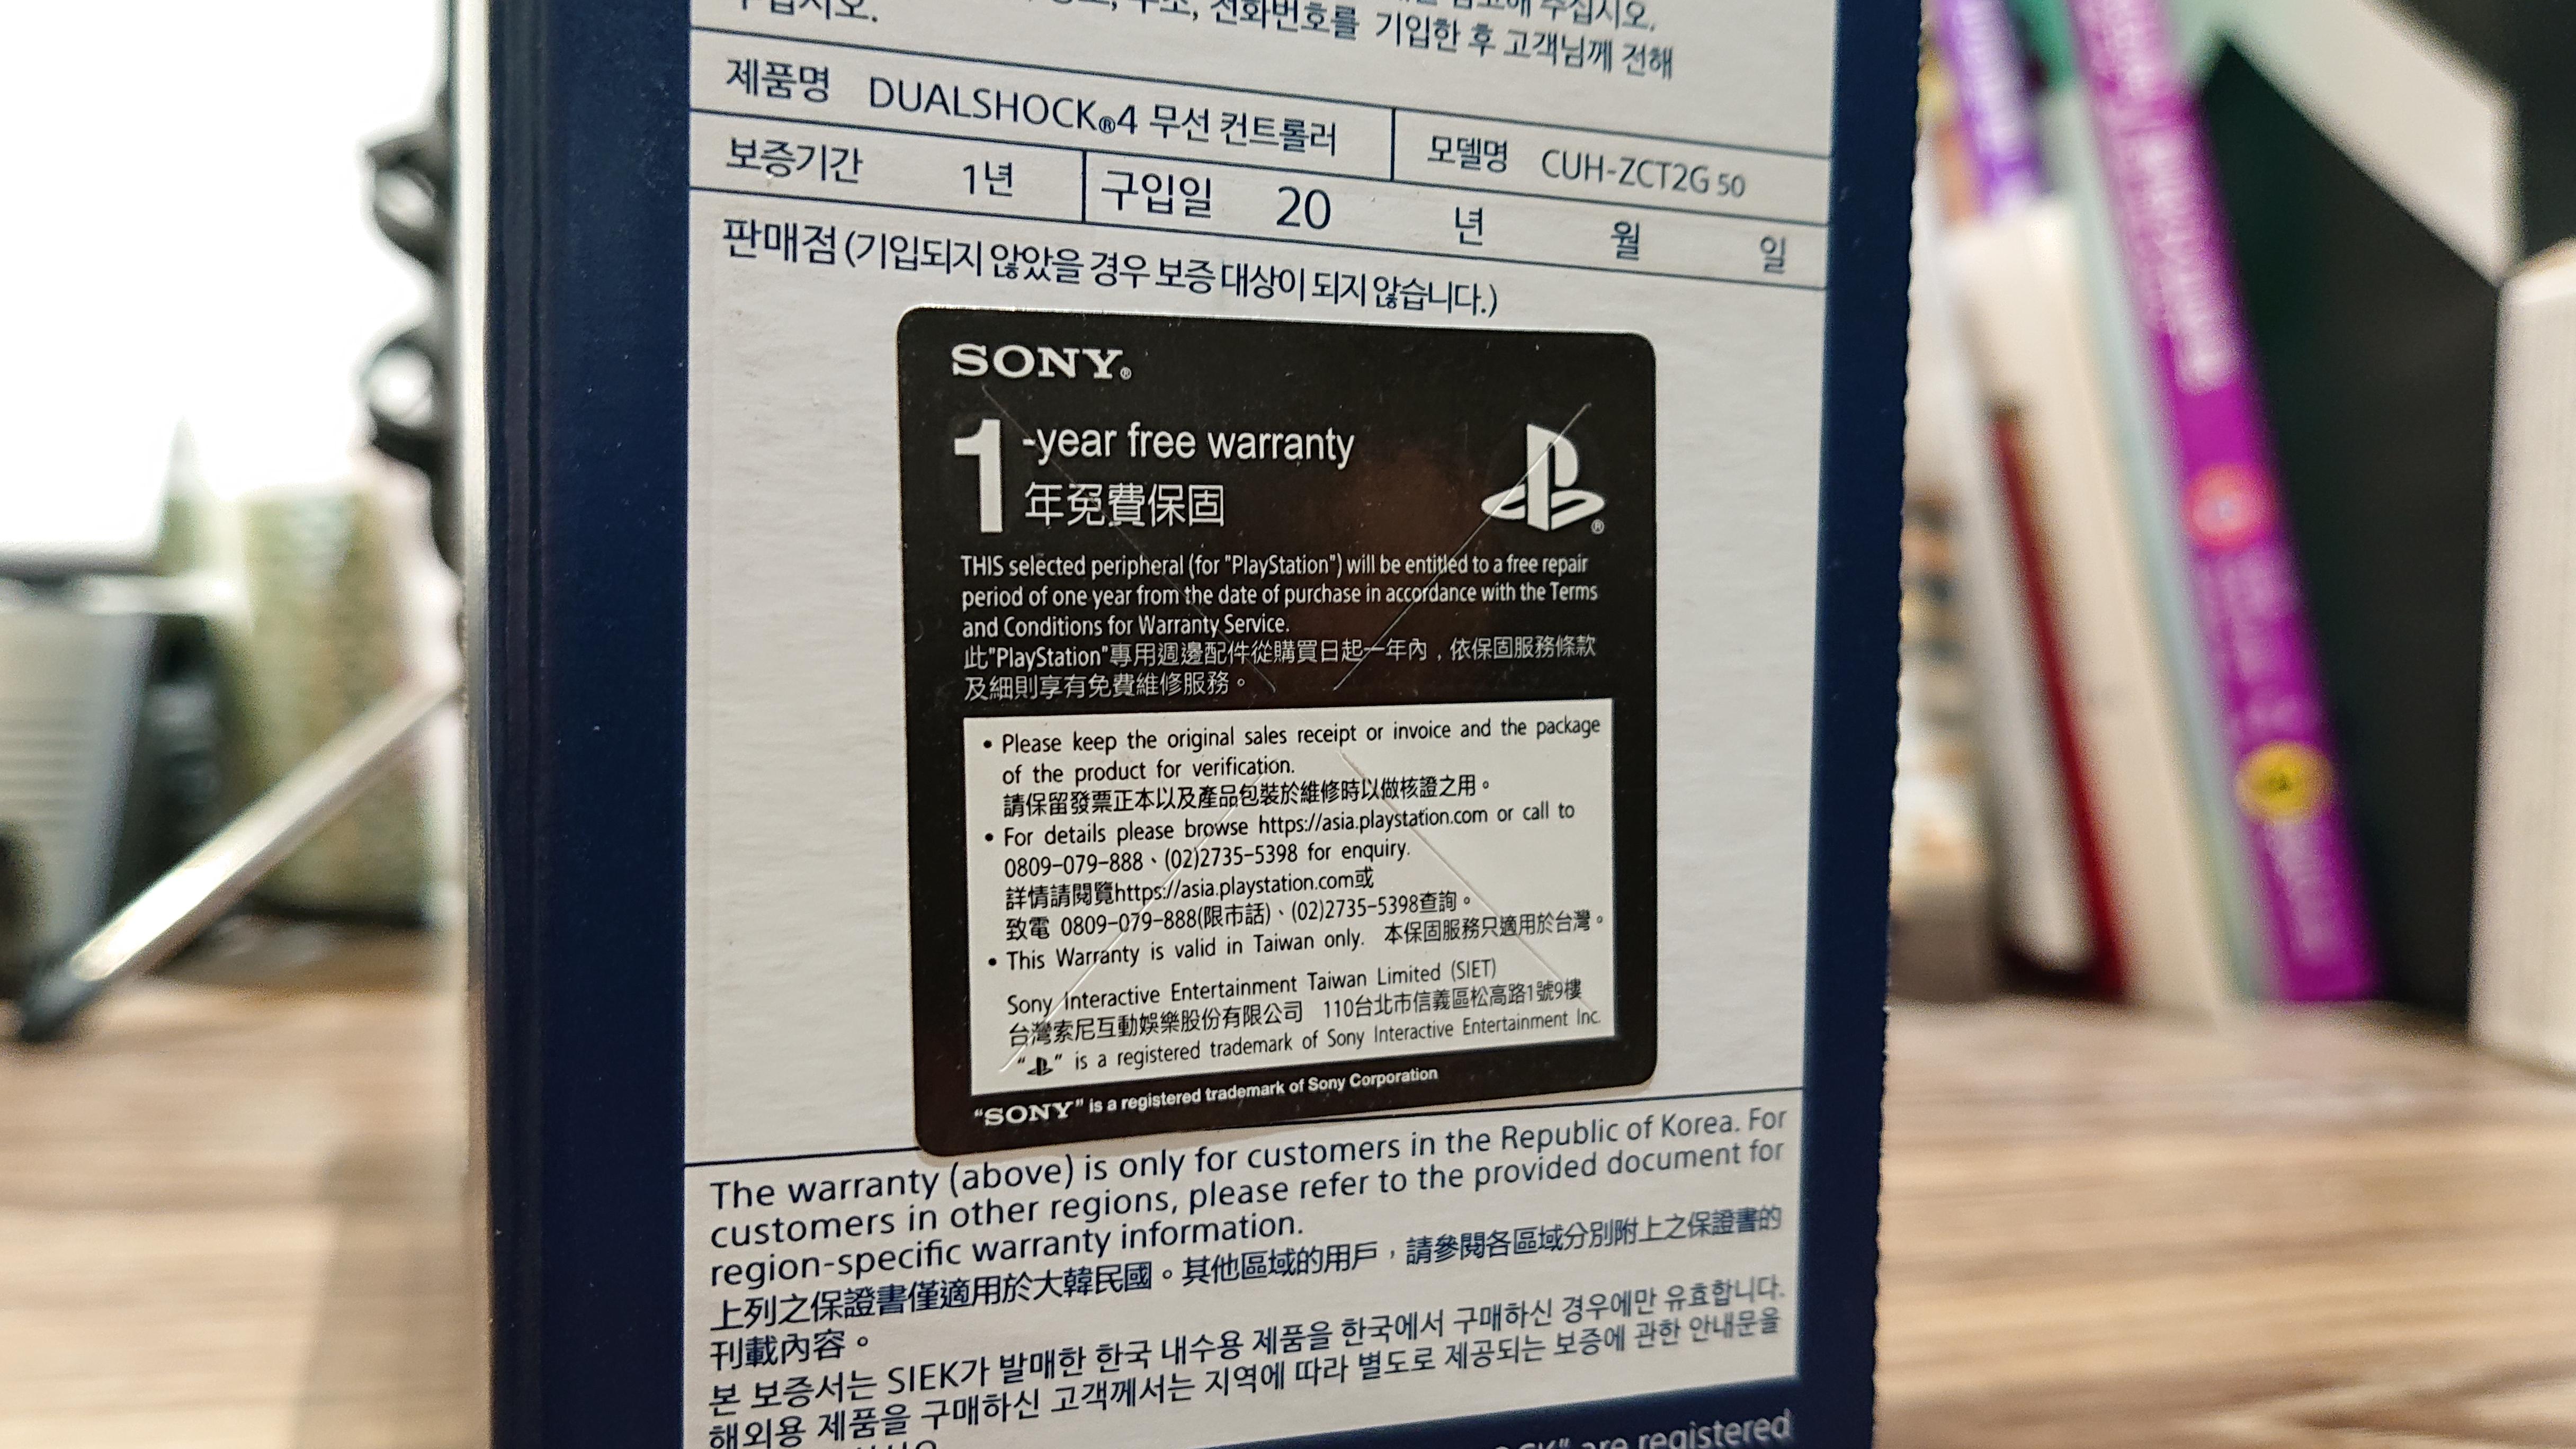 「開箱分享」 限量版 『500 Million Limited Edition』 PS4 遊戲搖桿入手!! - 9